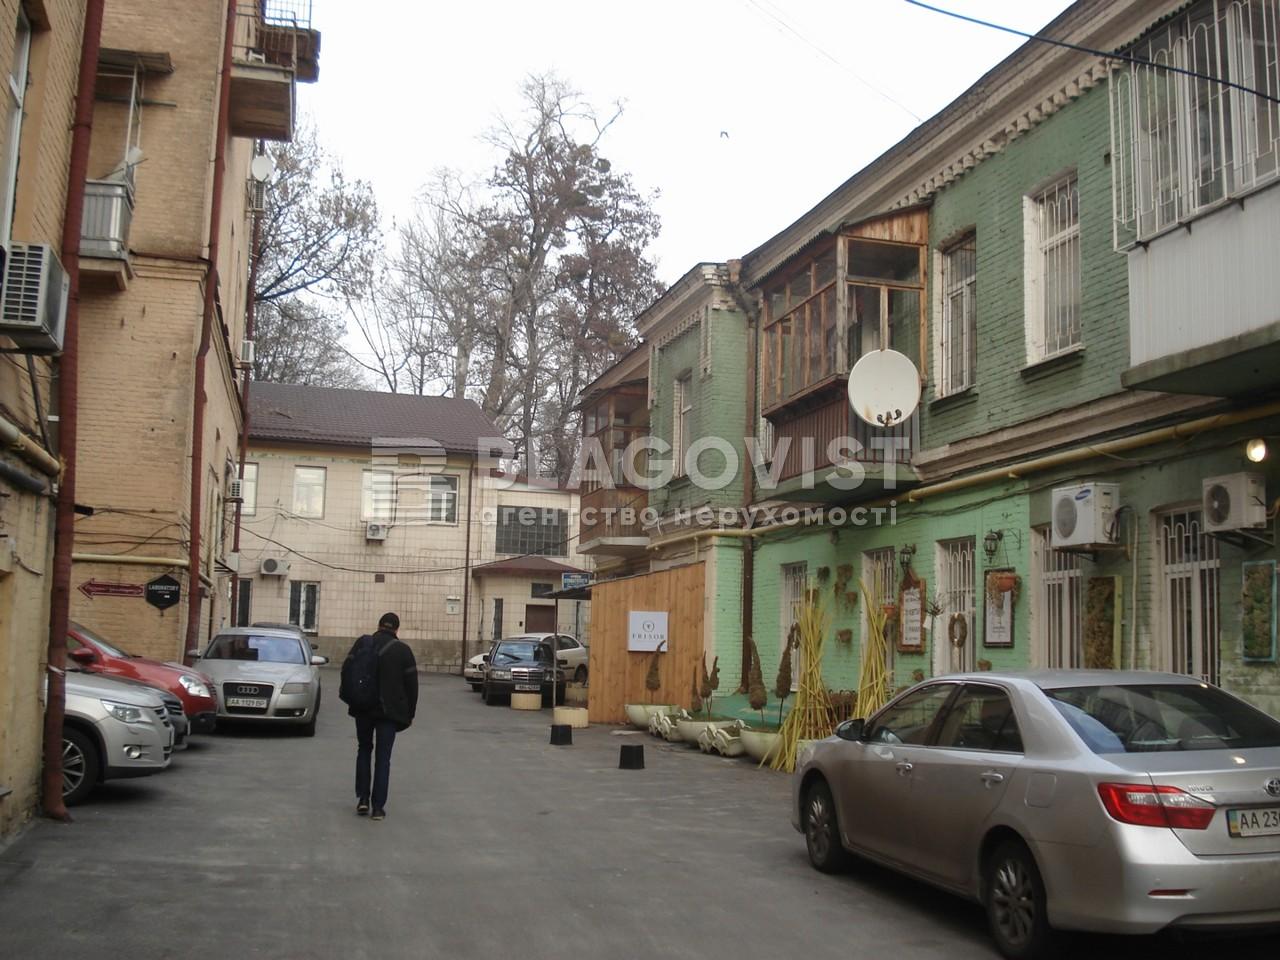 Квартира A-79992, Пушкінська, 9б, Київ - Фото 4